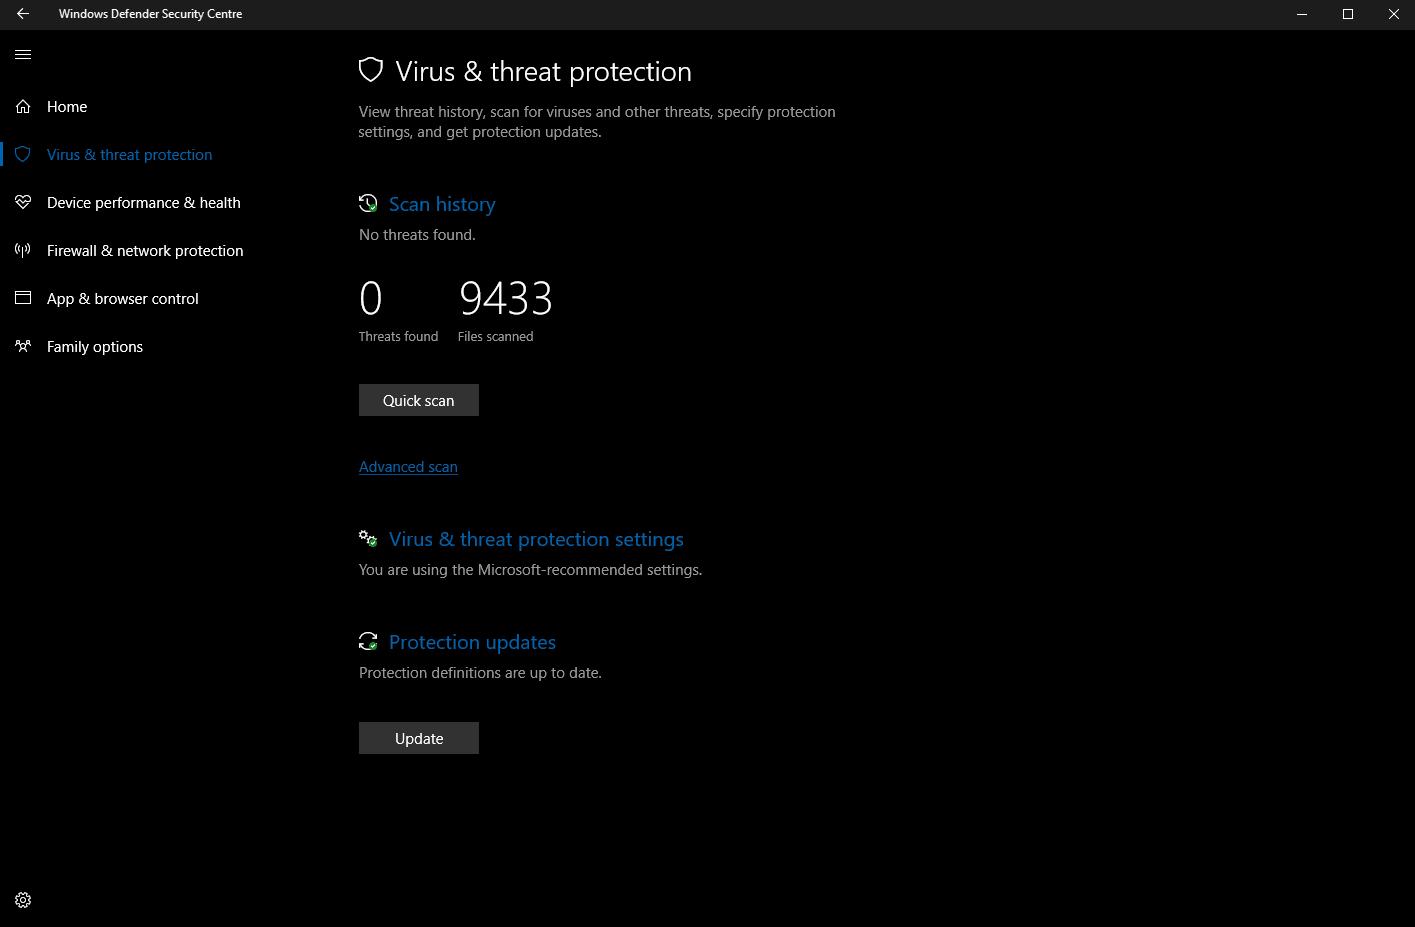 Latest windows 10 insider build 15042 brings windows defender improvements - onmsft. Com - february 25, 2017